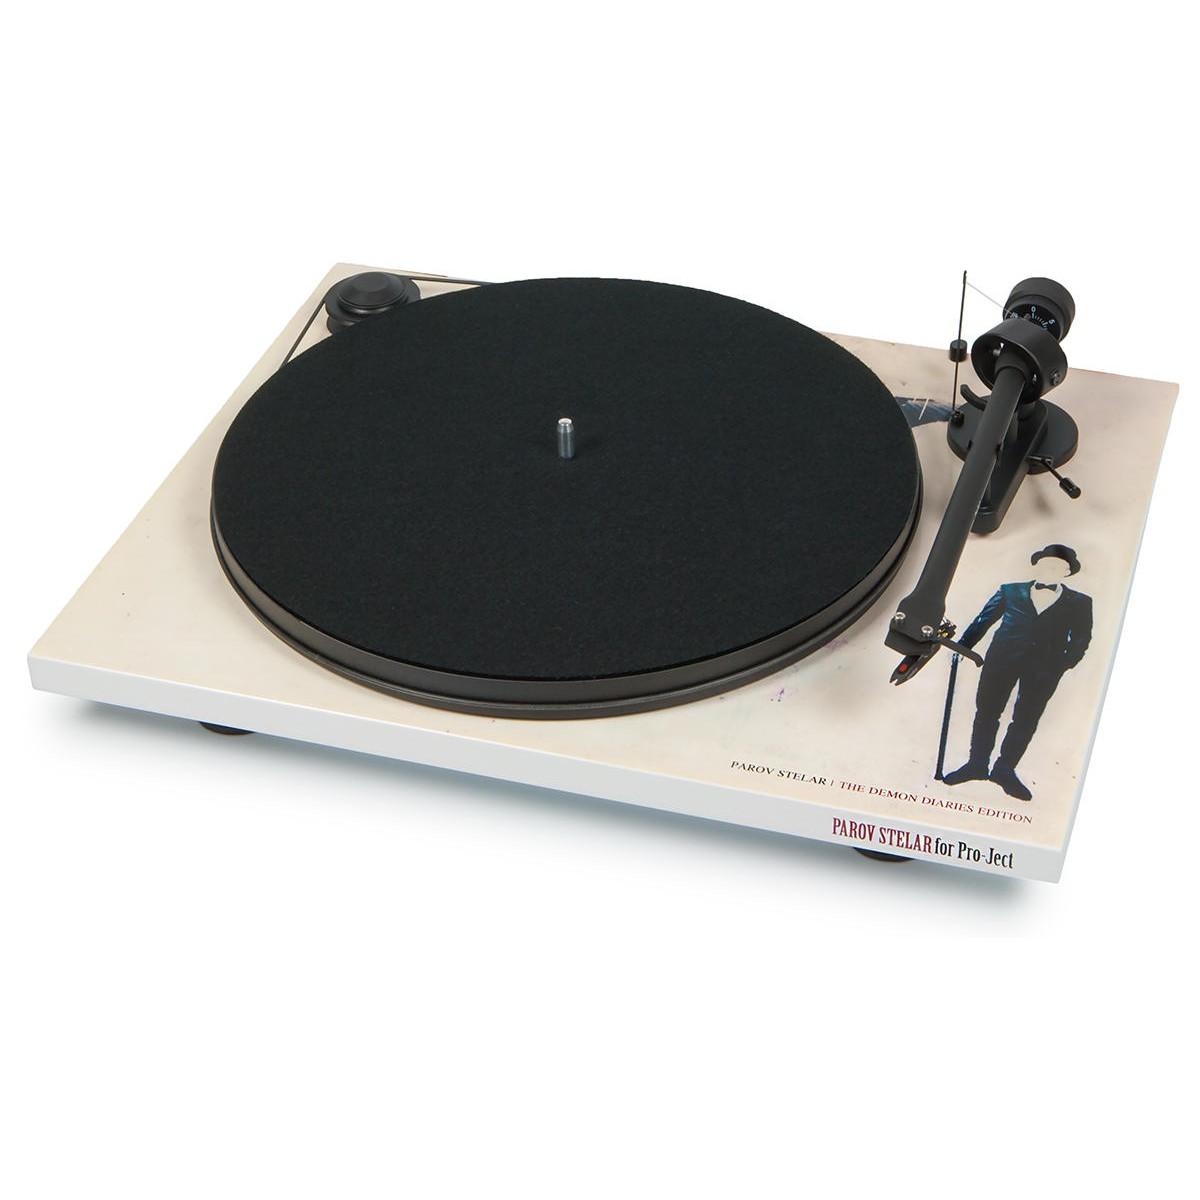 Gramofon ESSENTIAL II WHITE DEMON